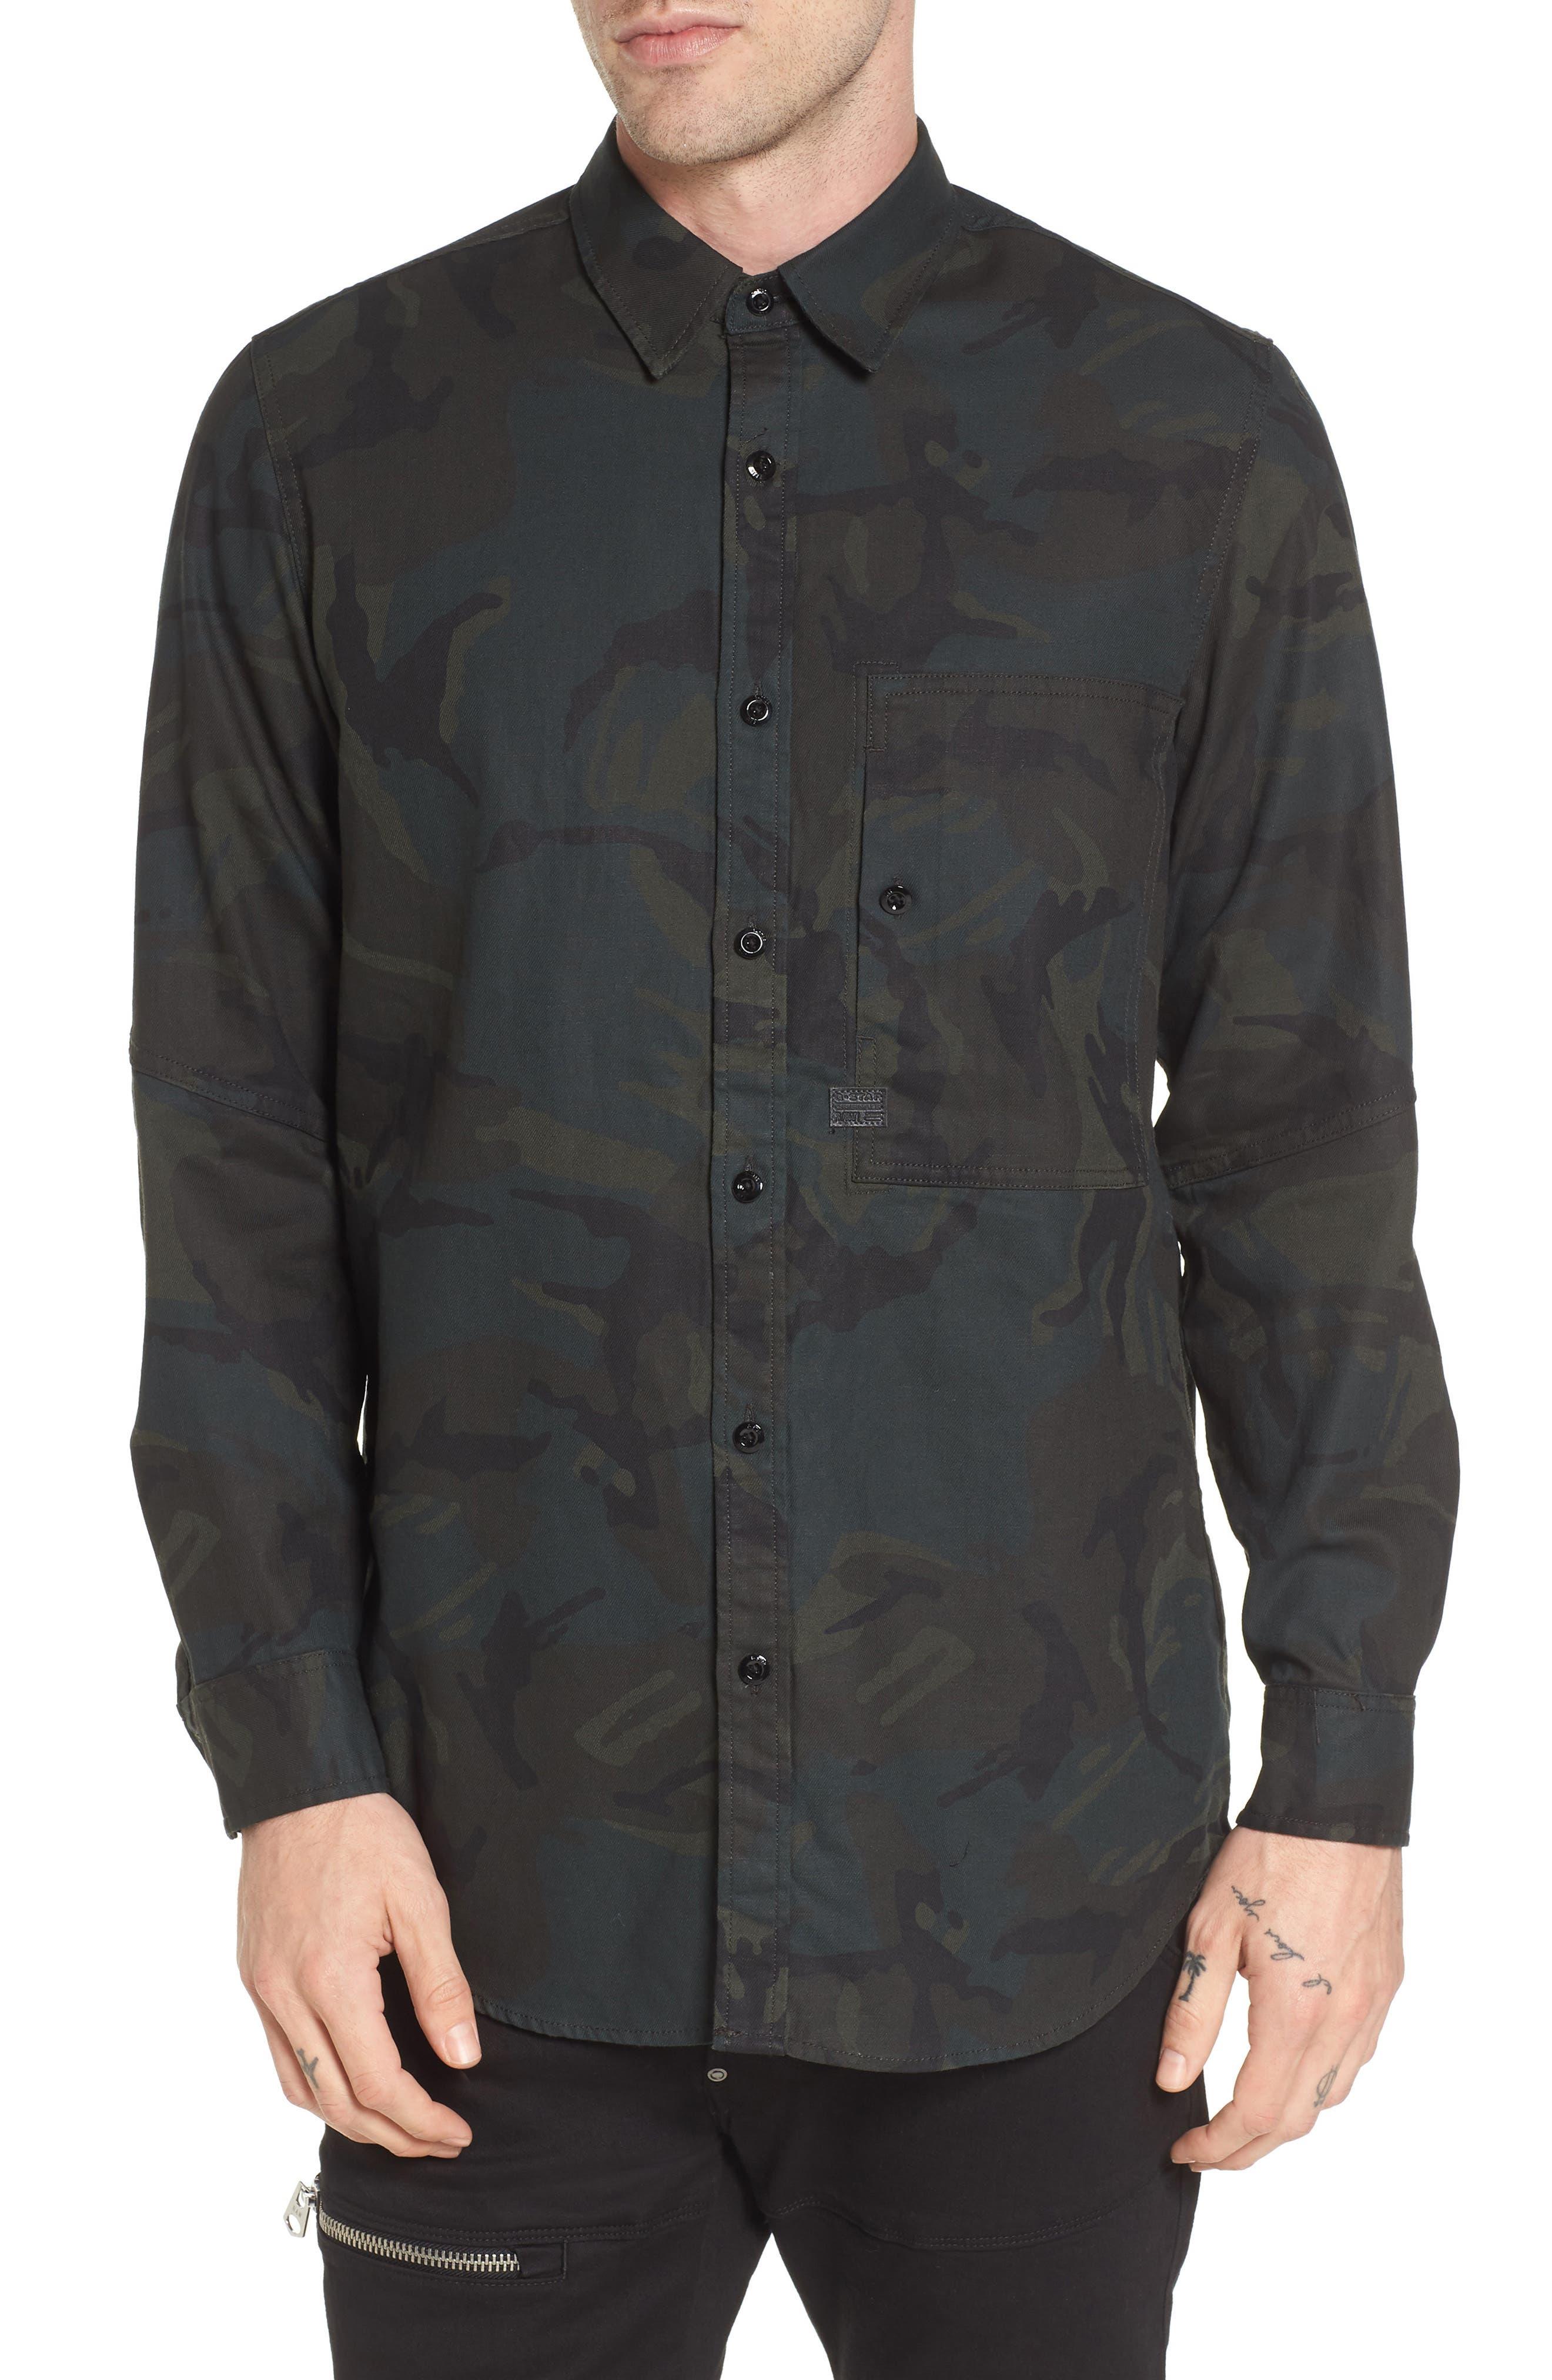 Stalt Long Sleeve Denim Shirt,                         Main,                         color, Asphalt/ Black